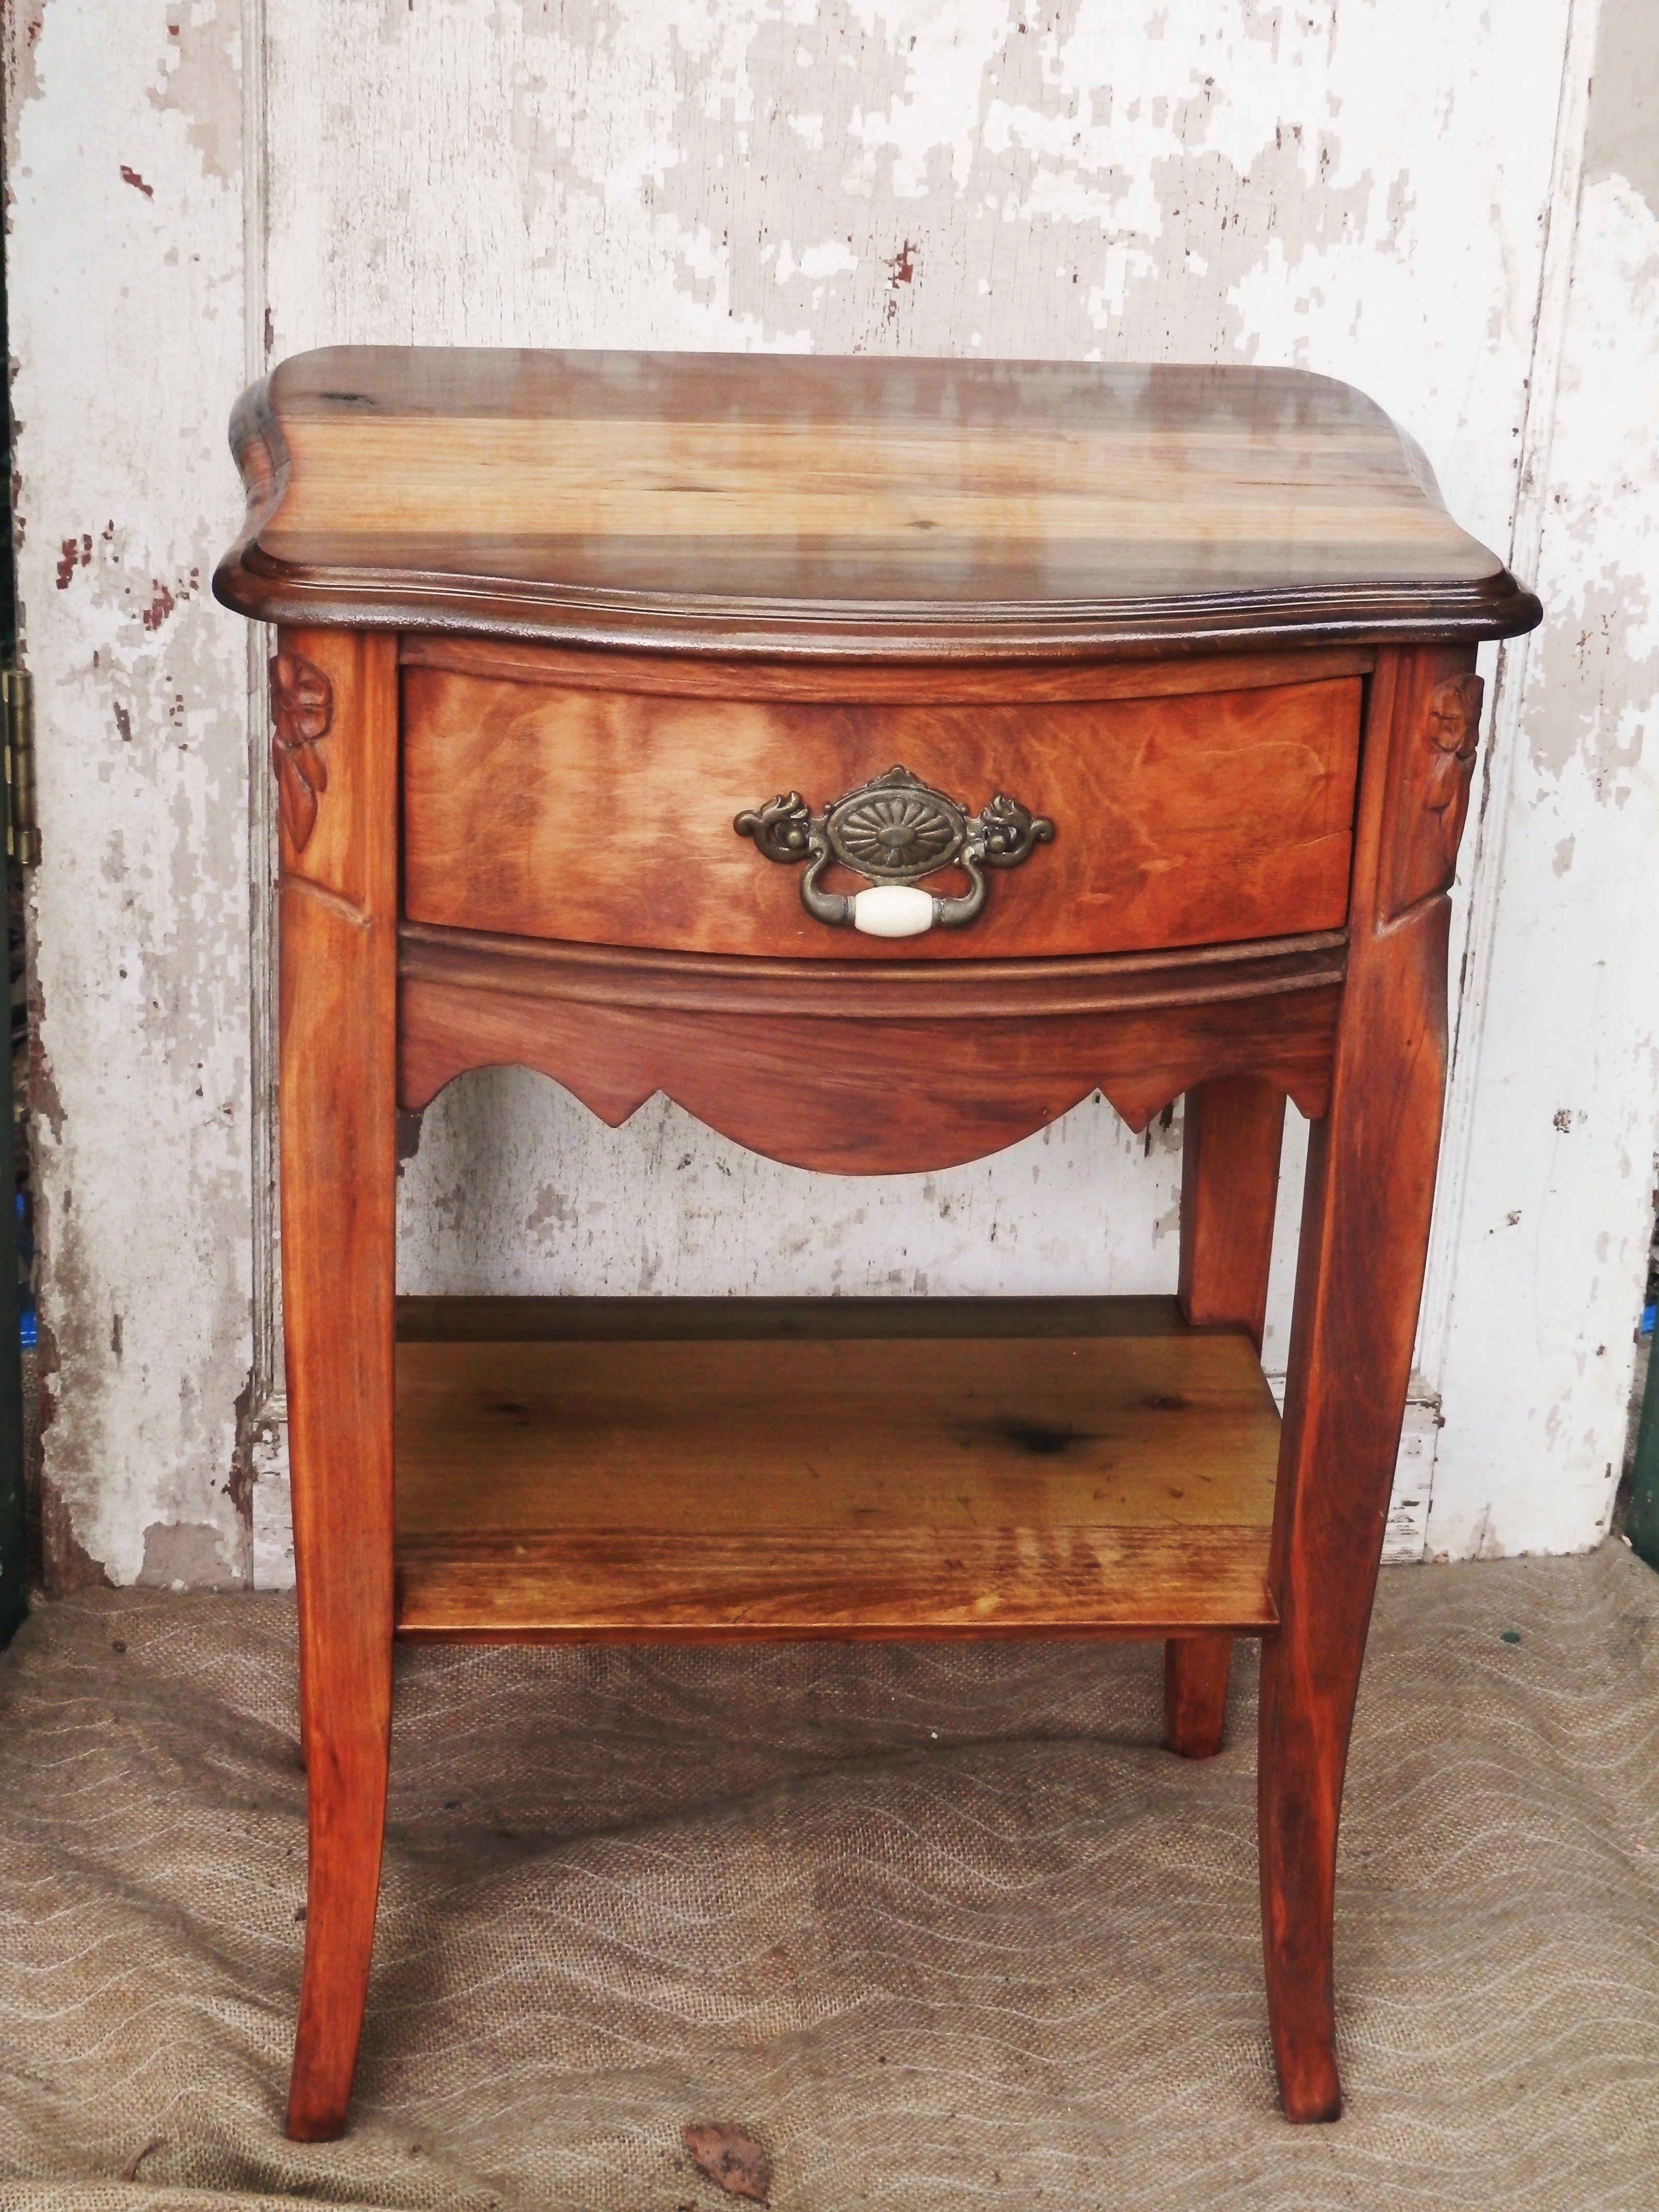 Antique night stand. Barn wood, Nightstand, Furniture